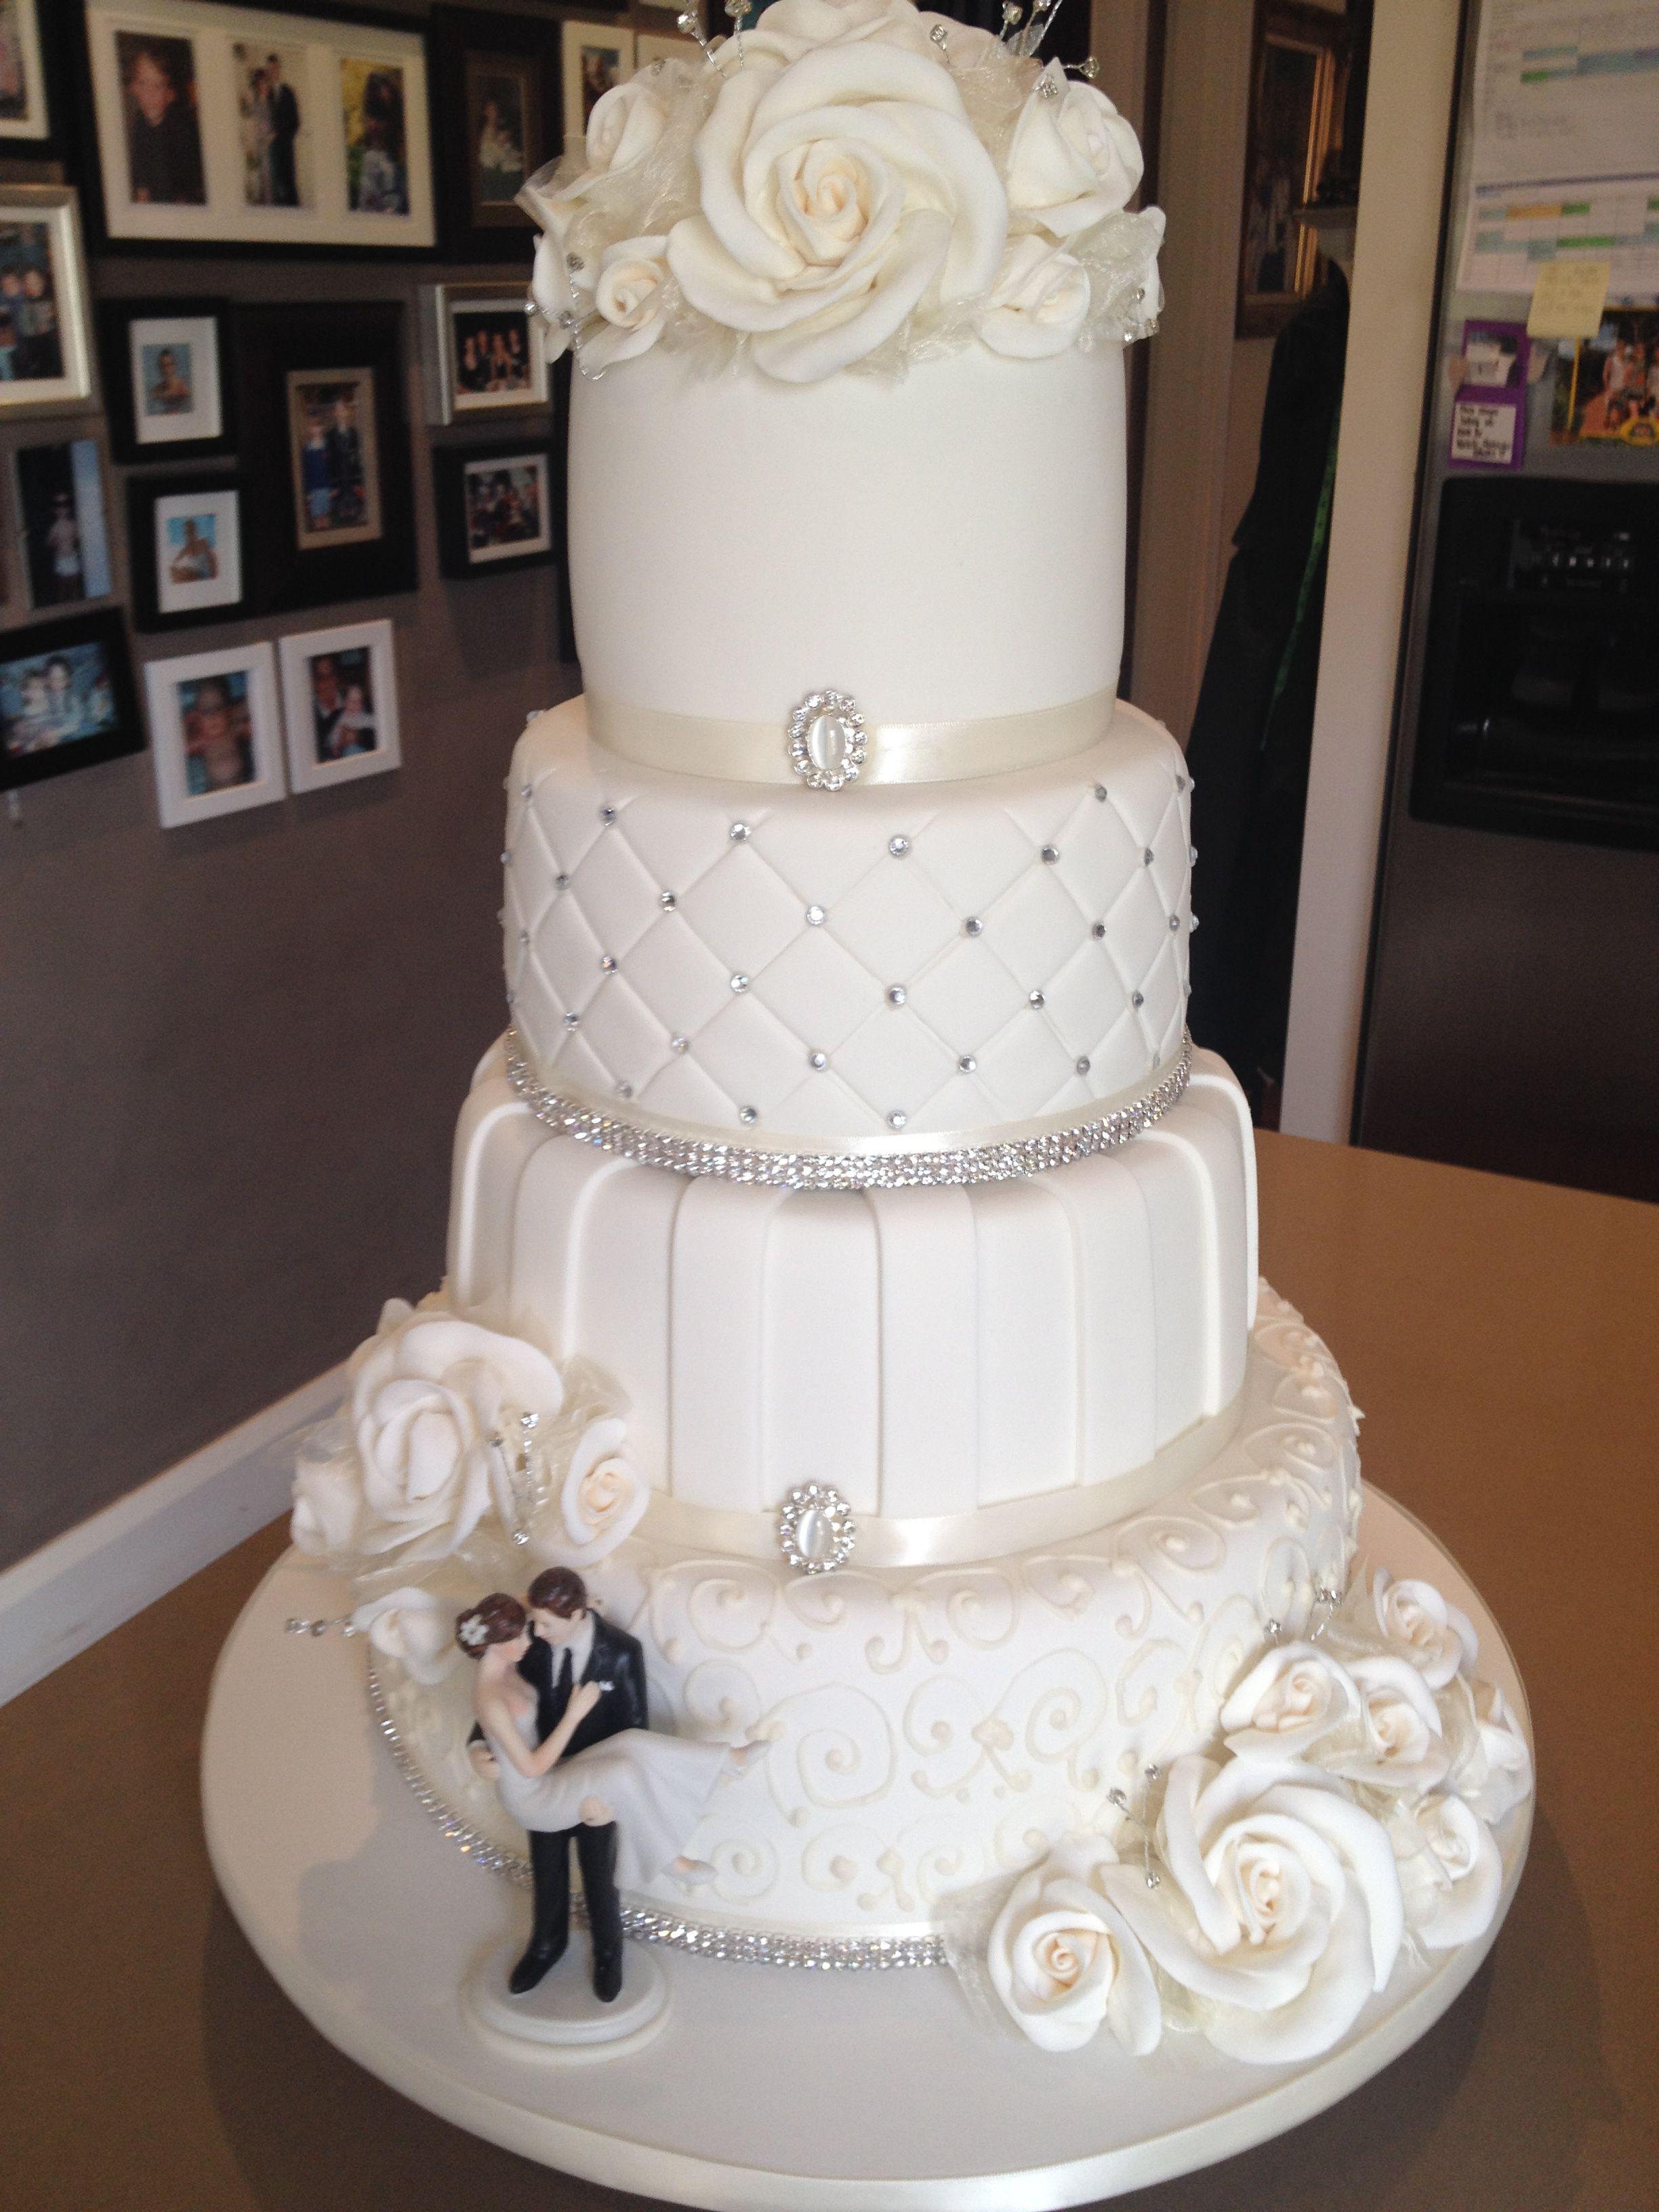 4 Tier Elegant Wedding Cake 12 Layers Of Homemade Cake